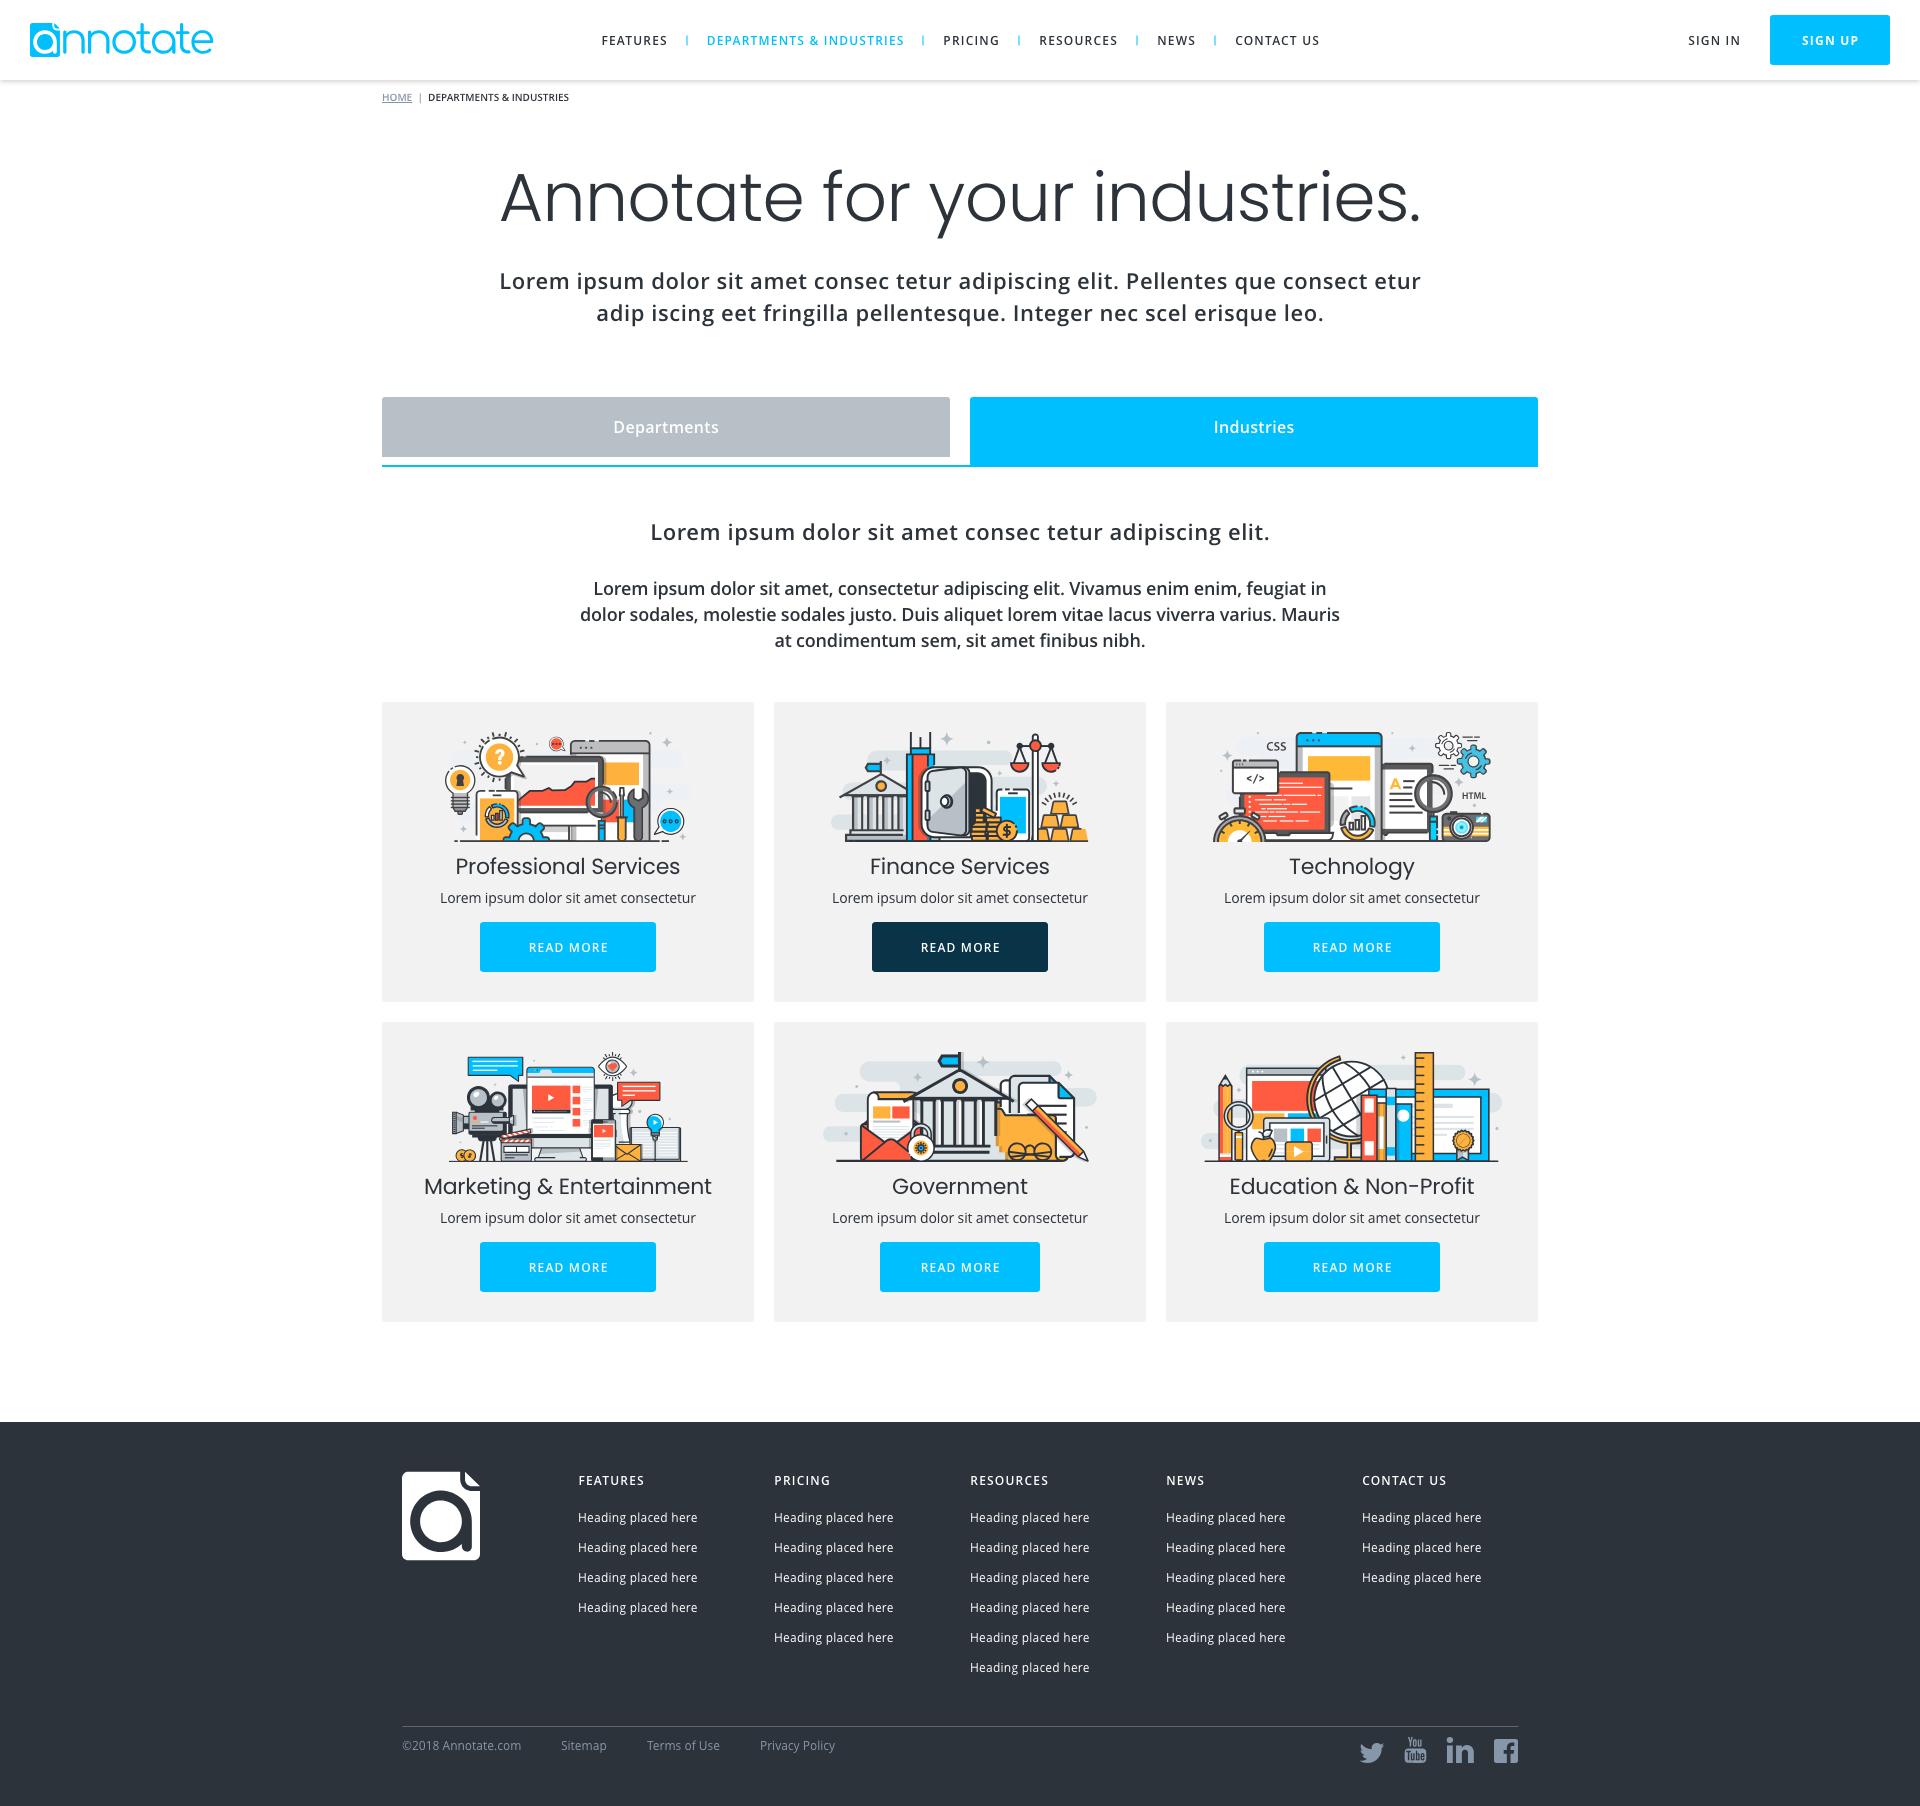 Annotate Departments & Industries-1.jpg